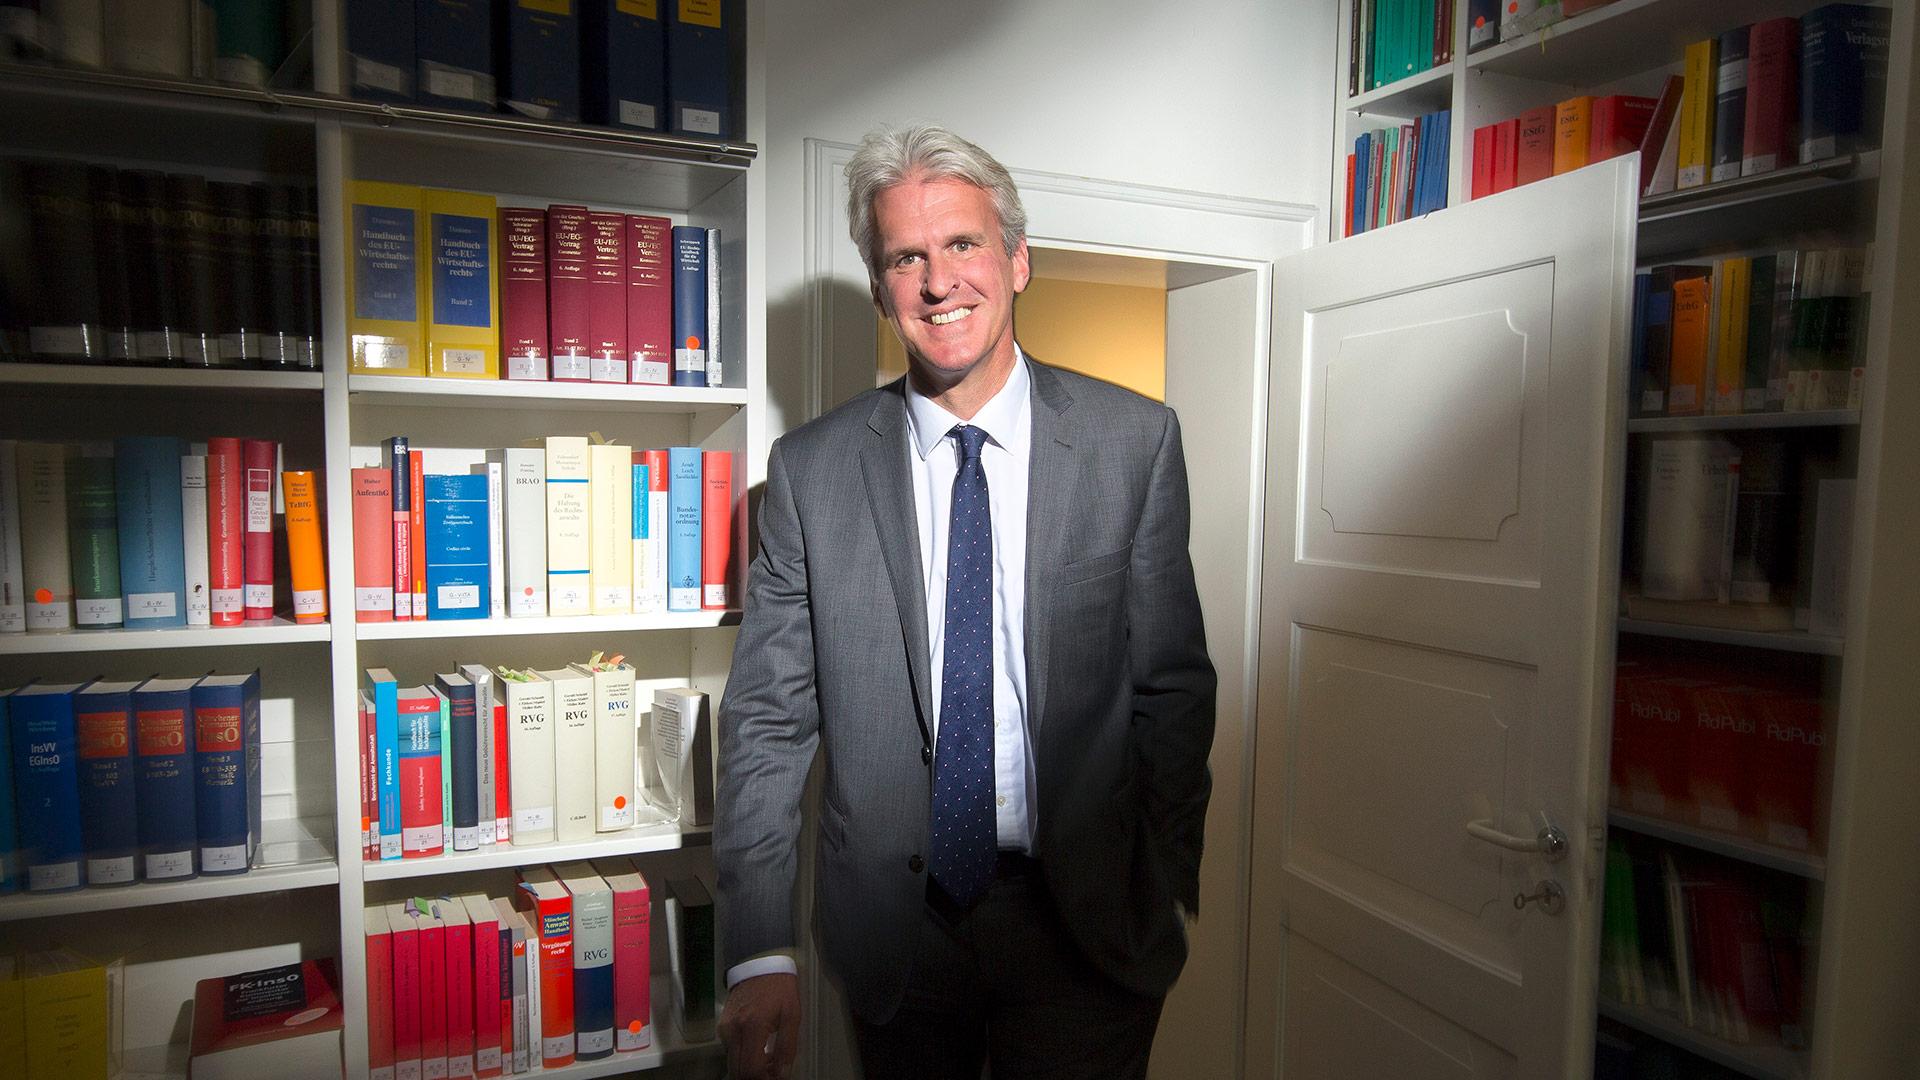 Dr. Sebastian Graf von Wallwitz